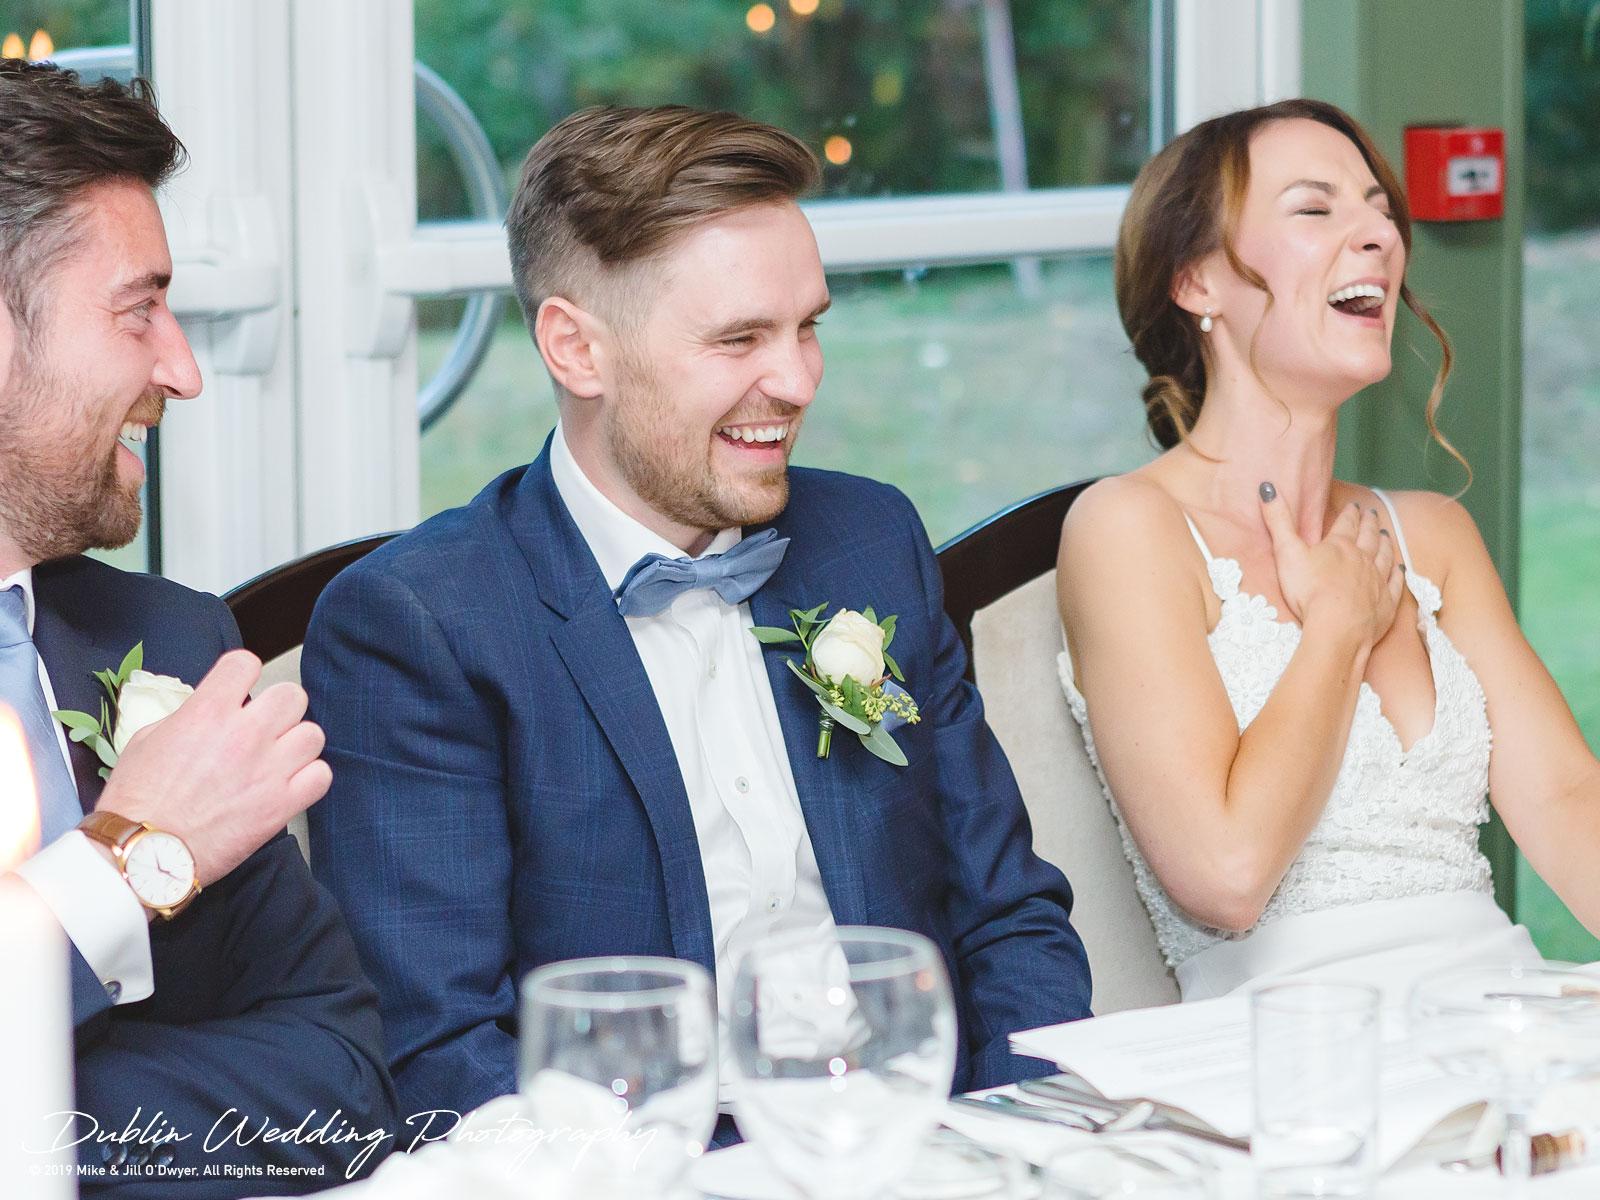 wedding-photographers-wicklow-tinakilly-house-2019-70.jpg